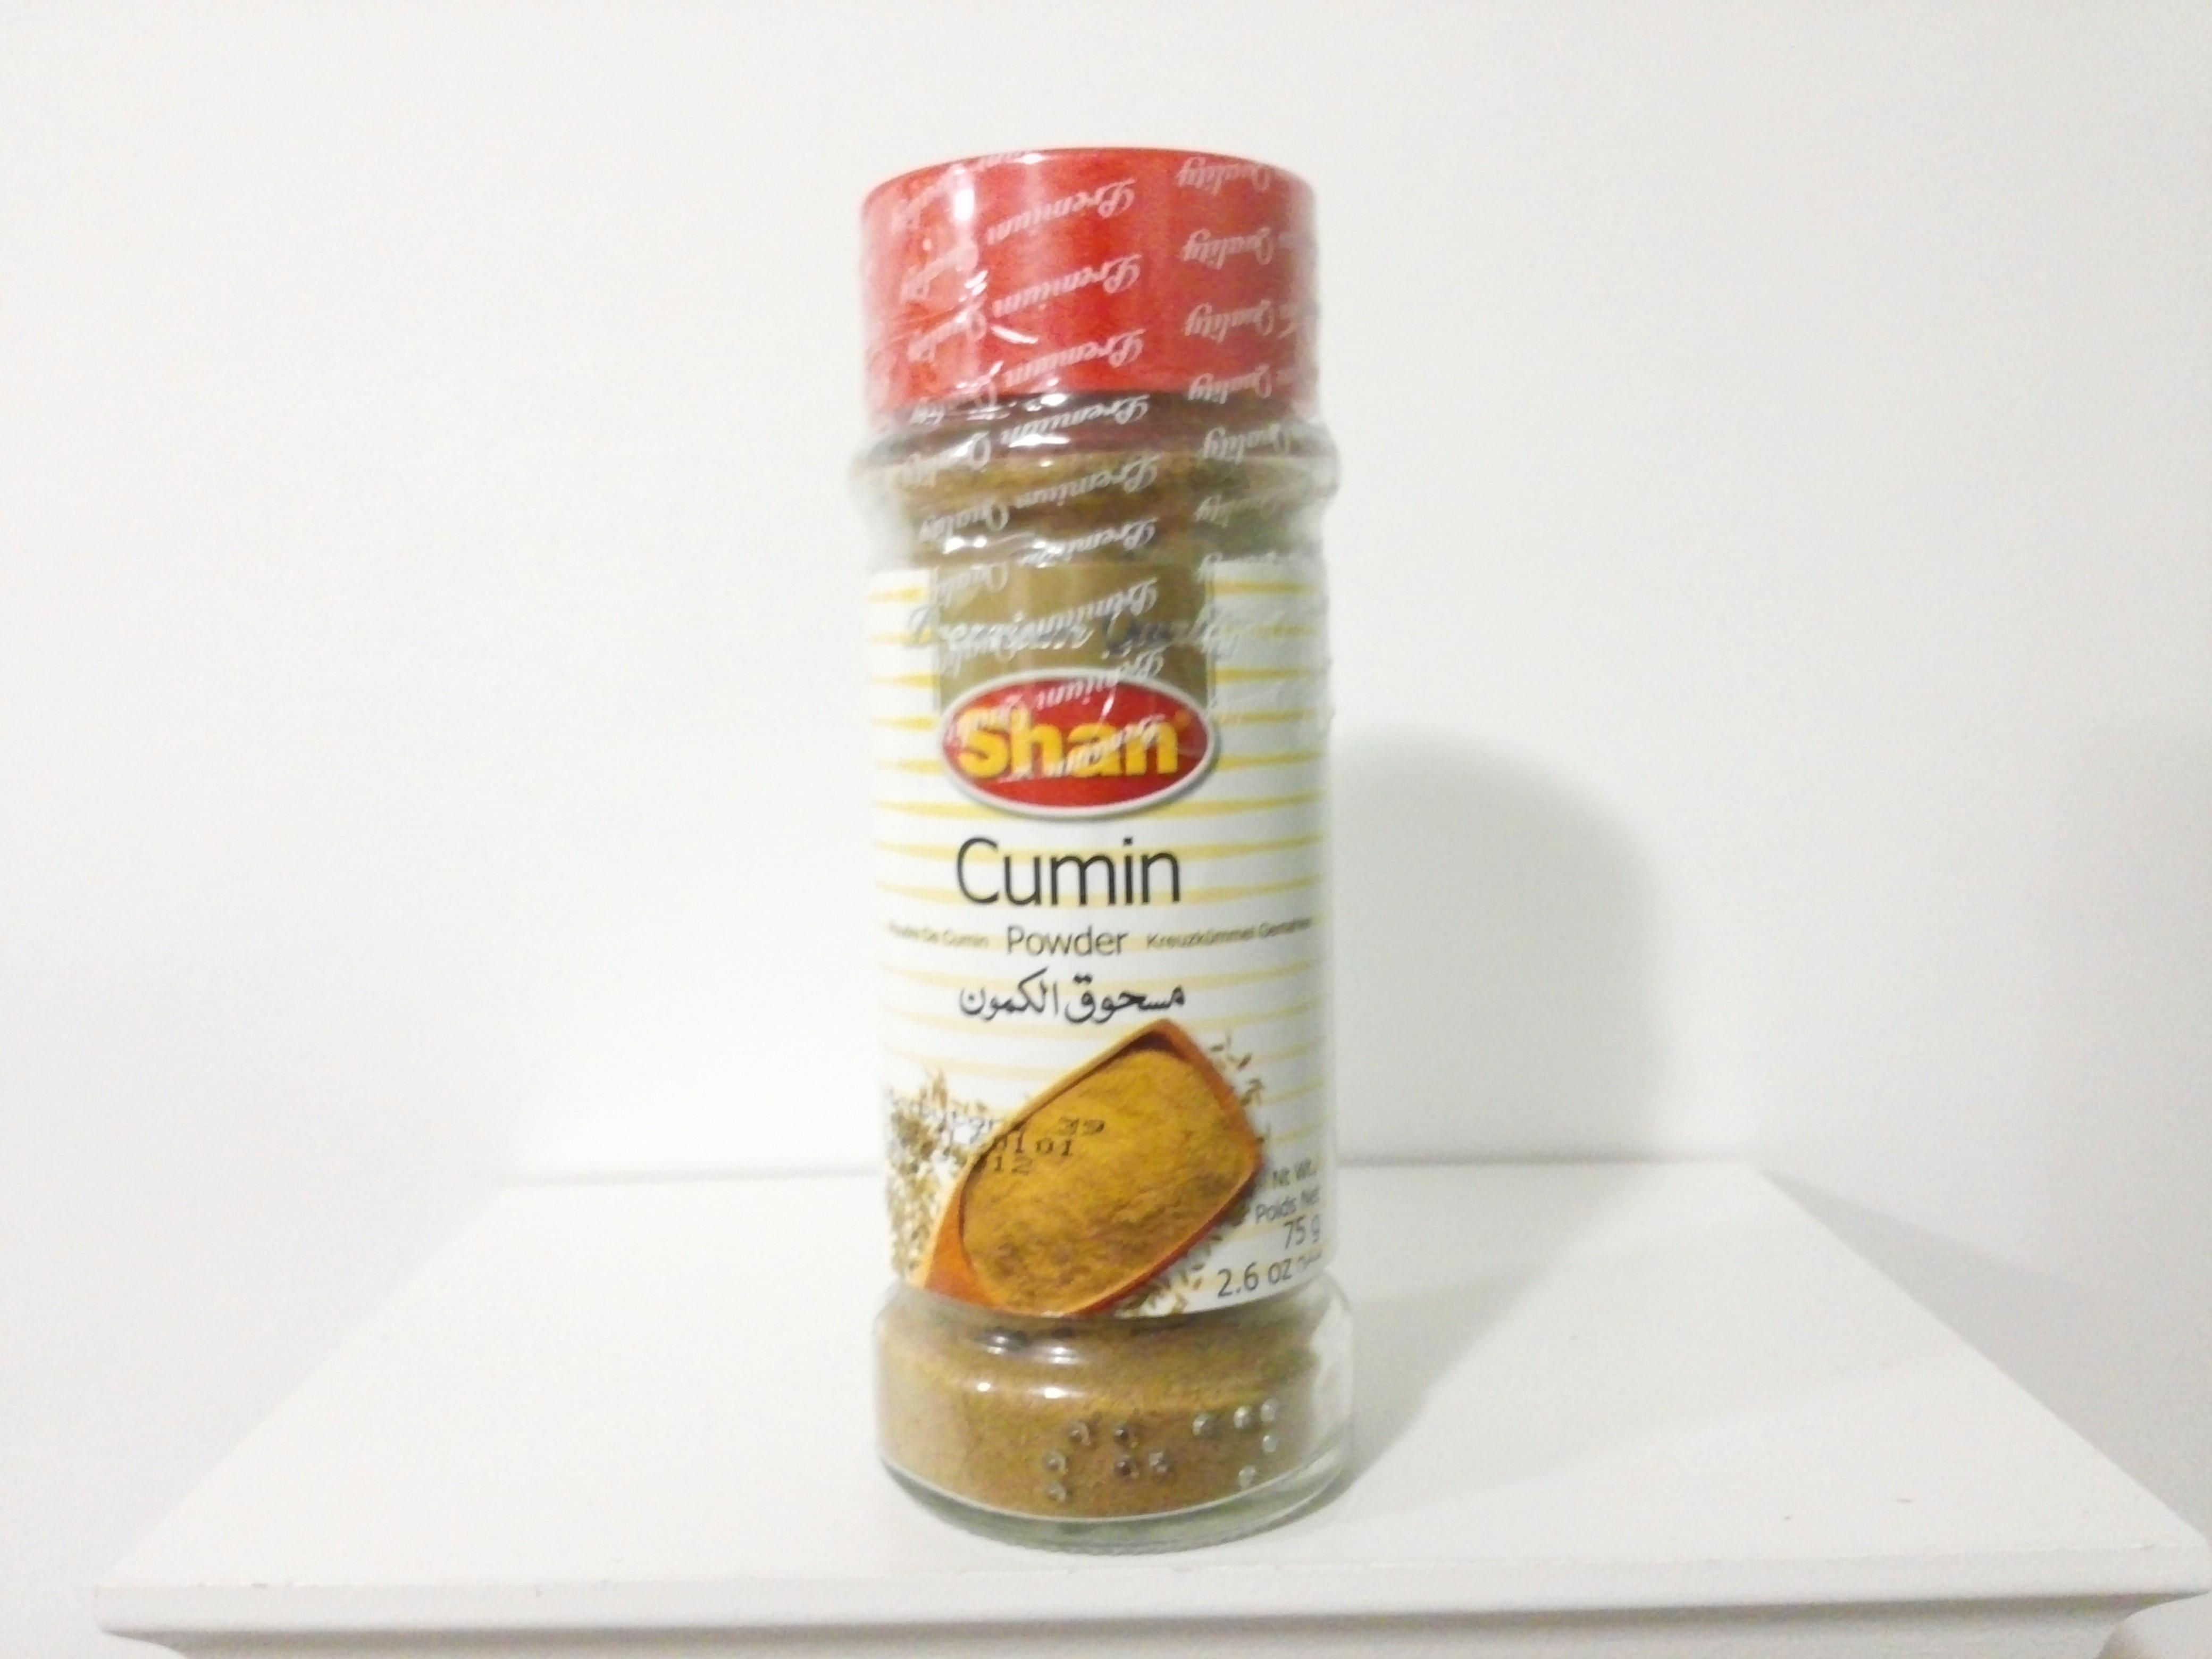 Shan Shaker-Cumin Powder 75 grm